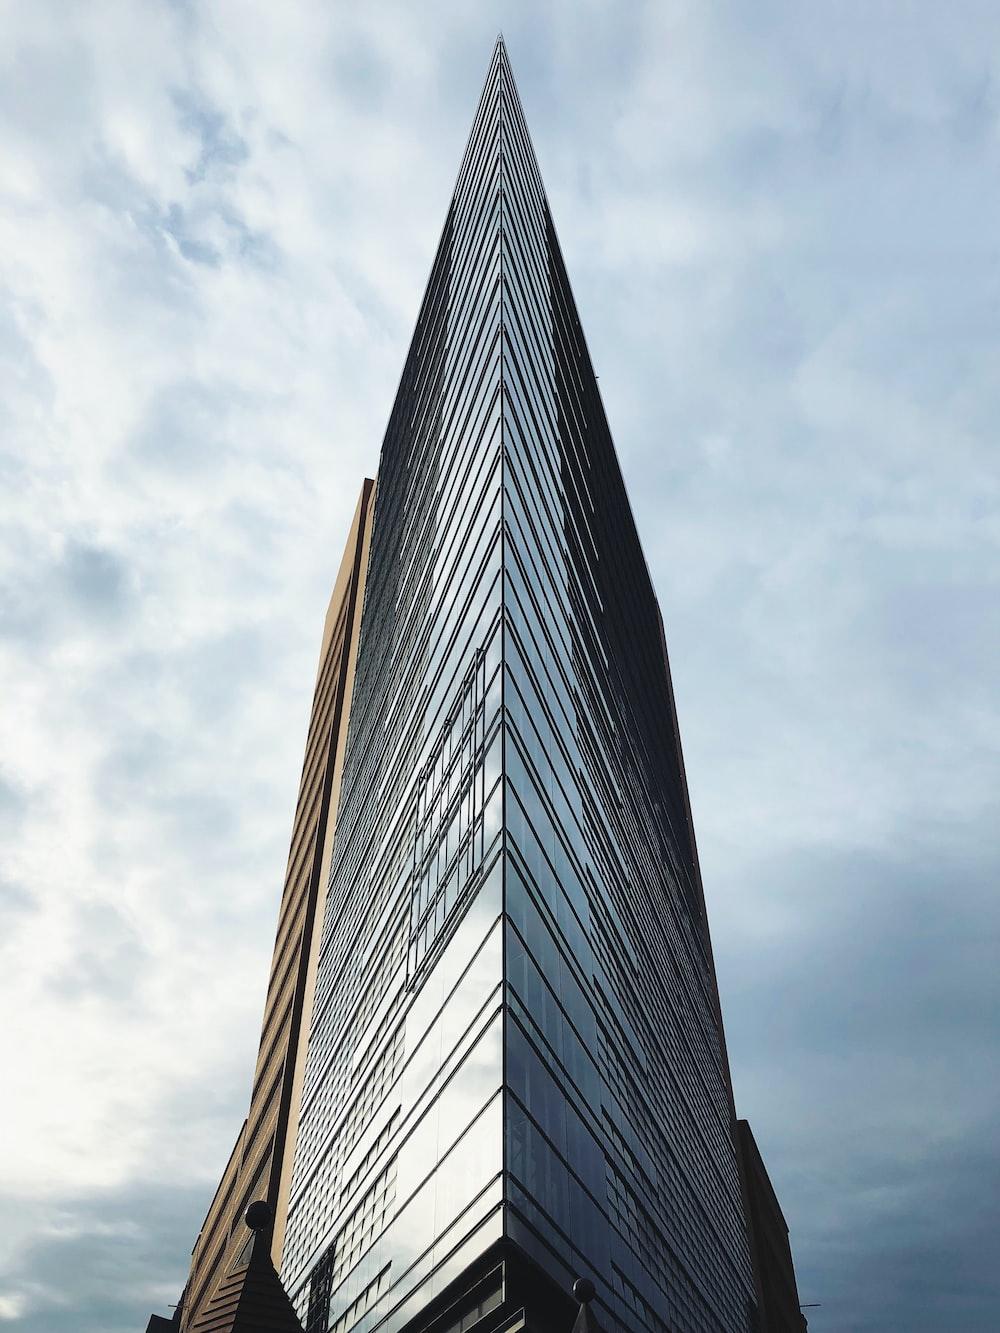 triangular curtain building during daytime